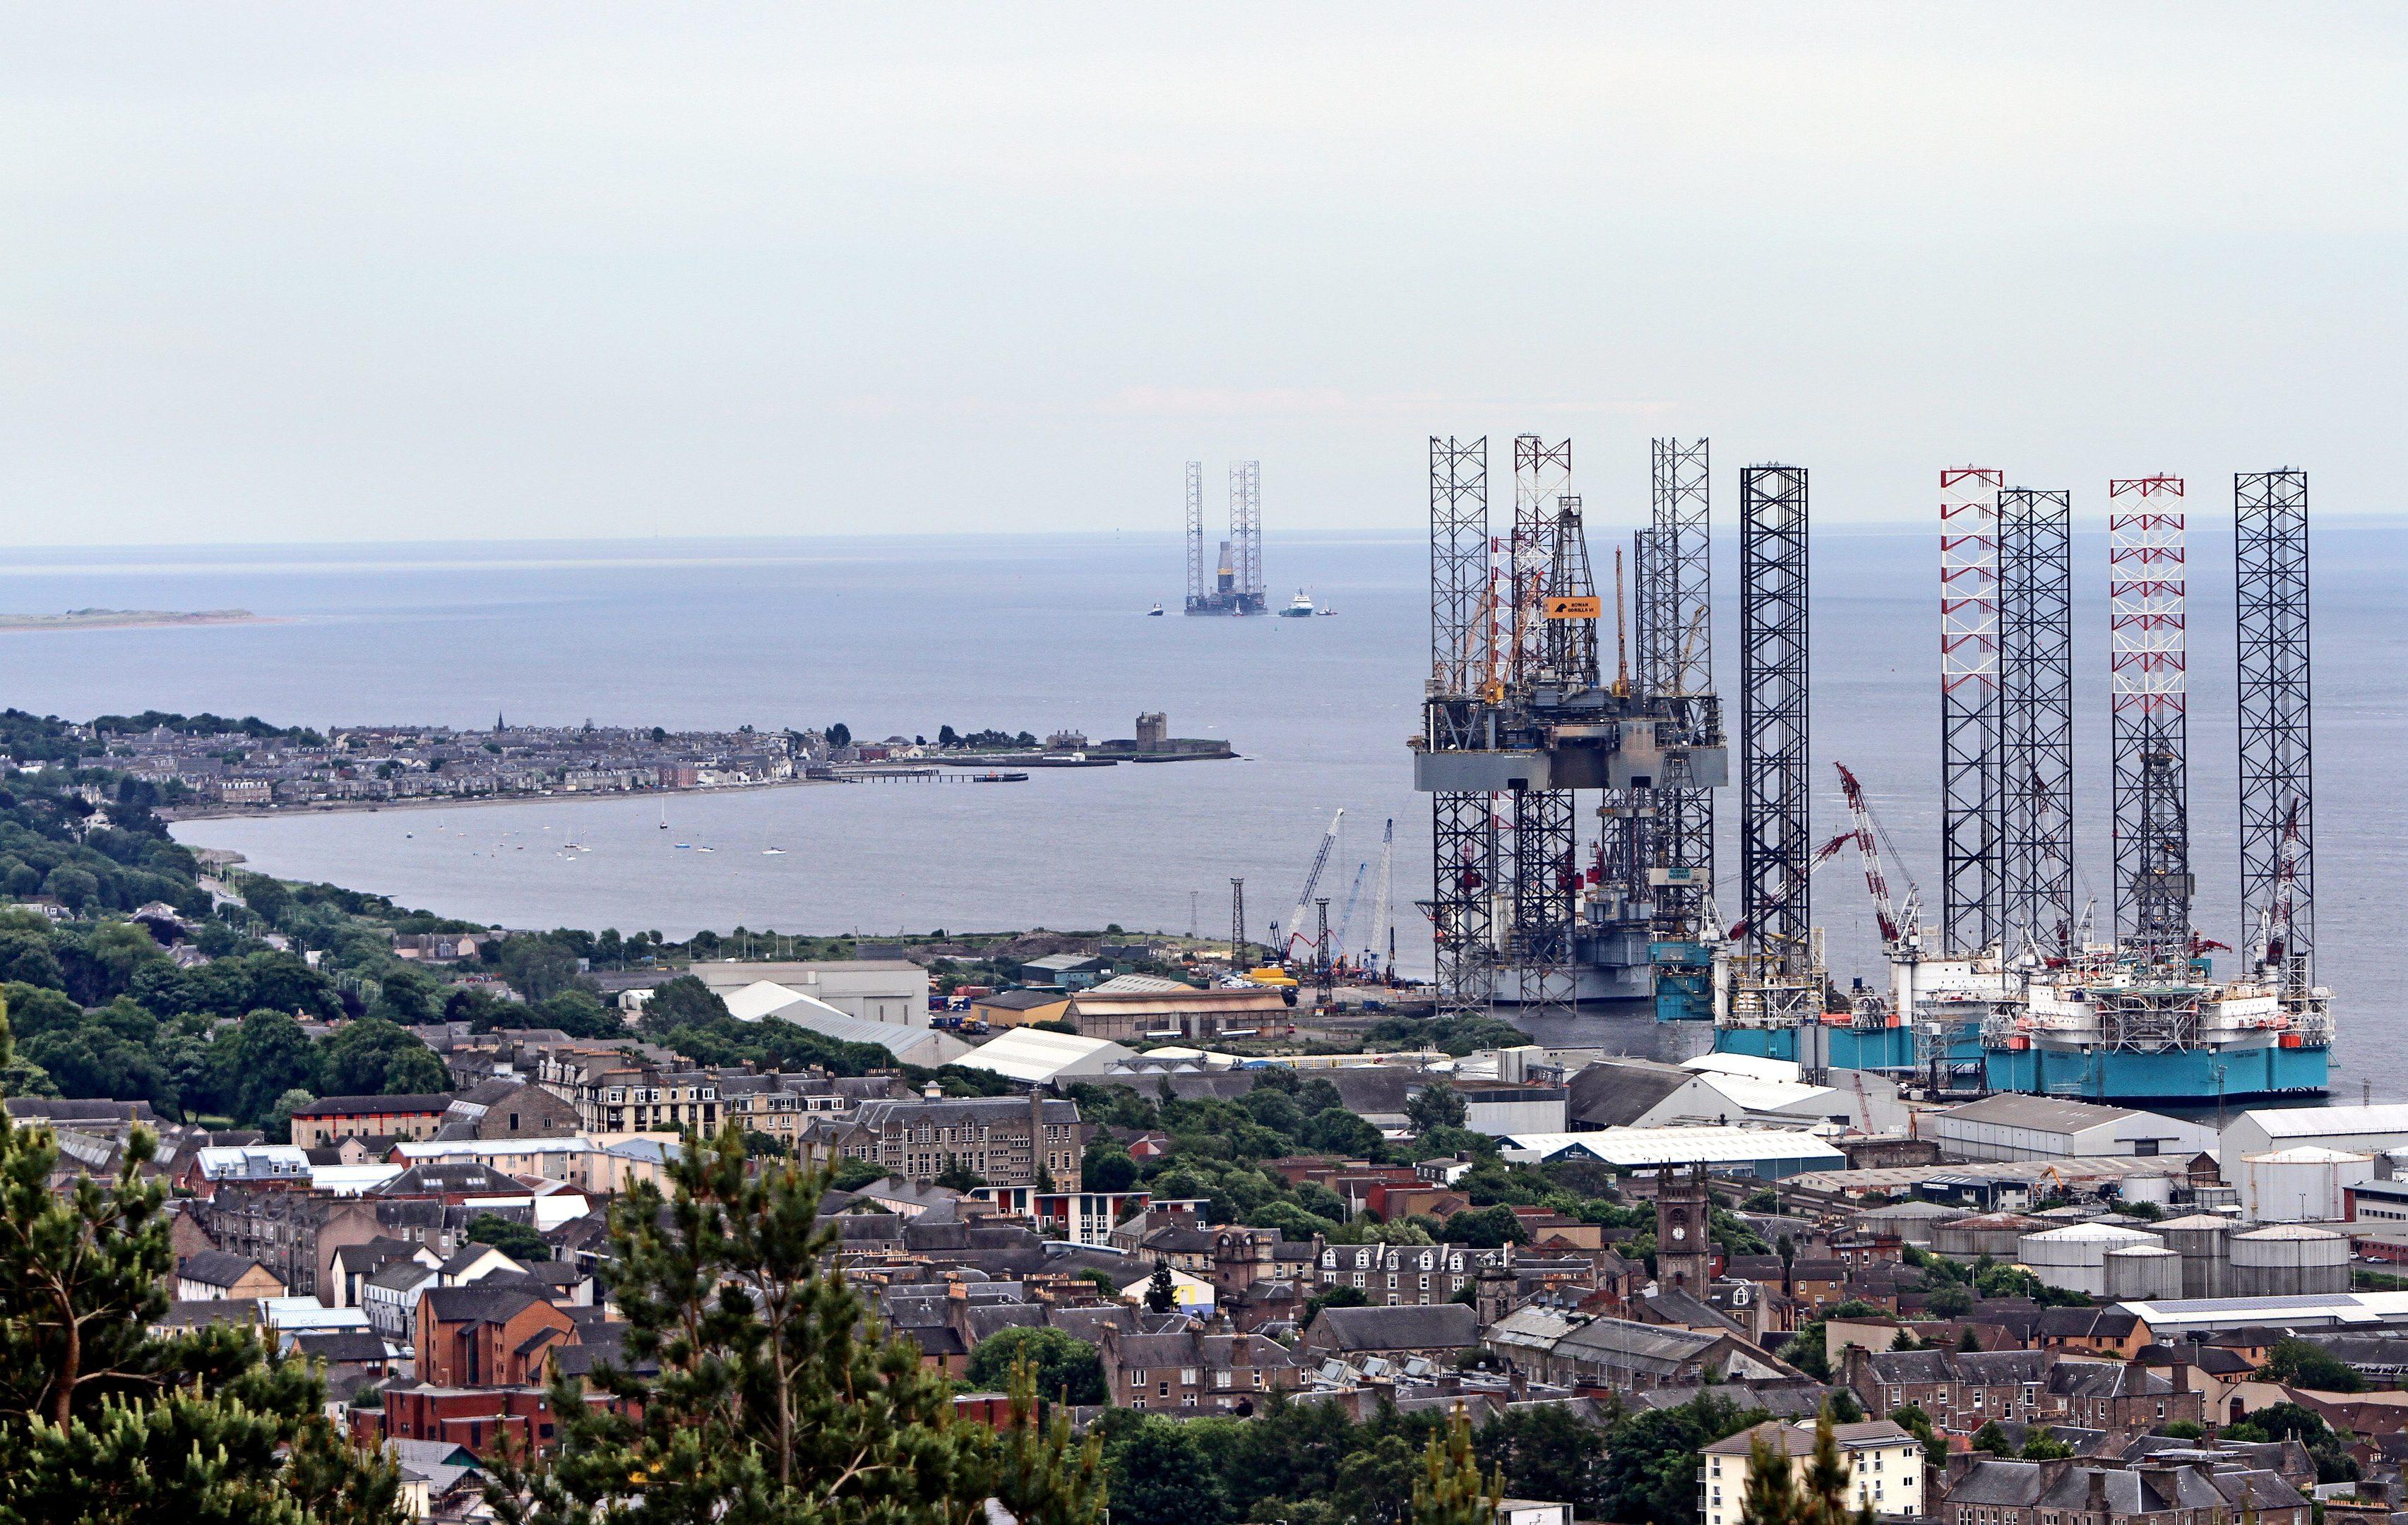 The Rowan Gorilla V Oil Rig arrives in Dundee Port.